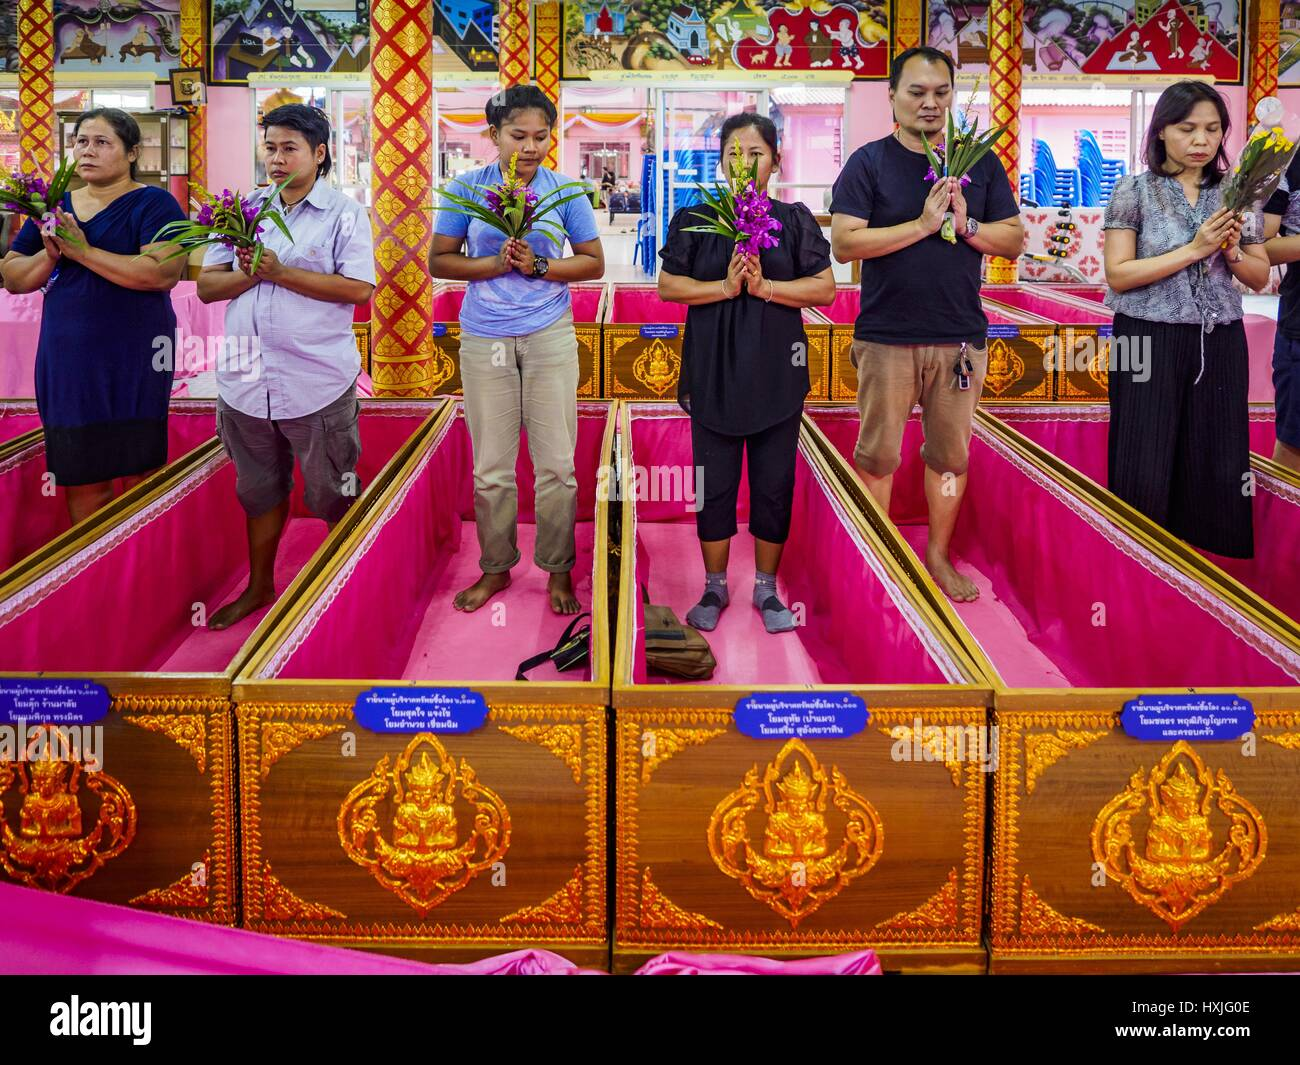 Bang Kruai, Nonthaburi, Tailandia. 29 Mar, 2017. La gente va a ir a través de sus rituales de muerte durante Imagen De Stock